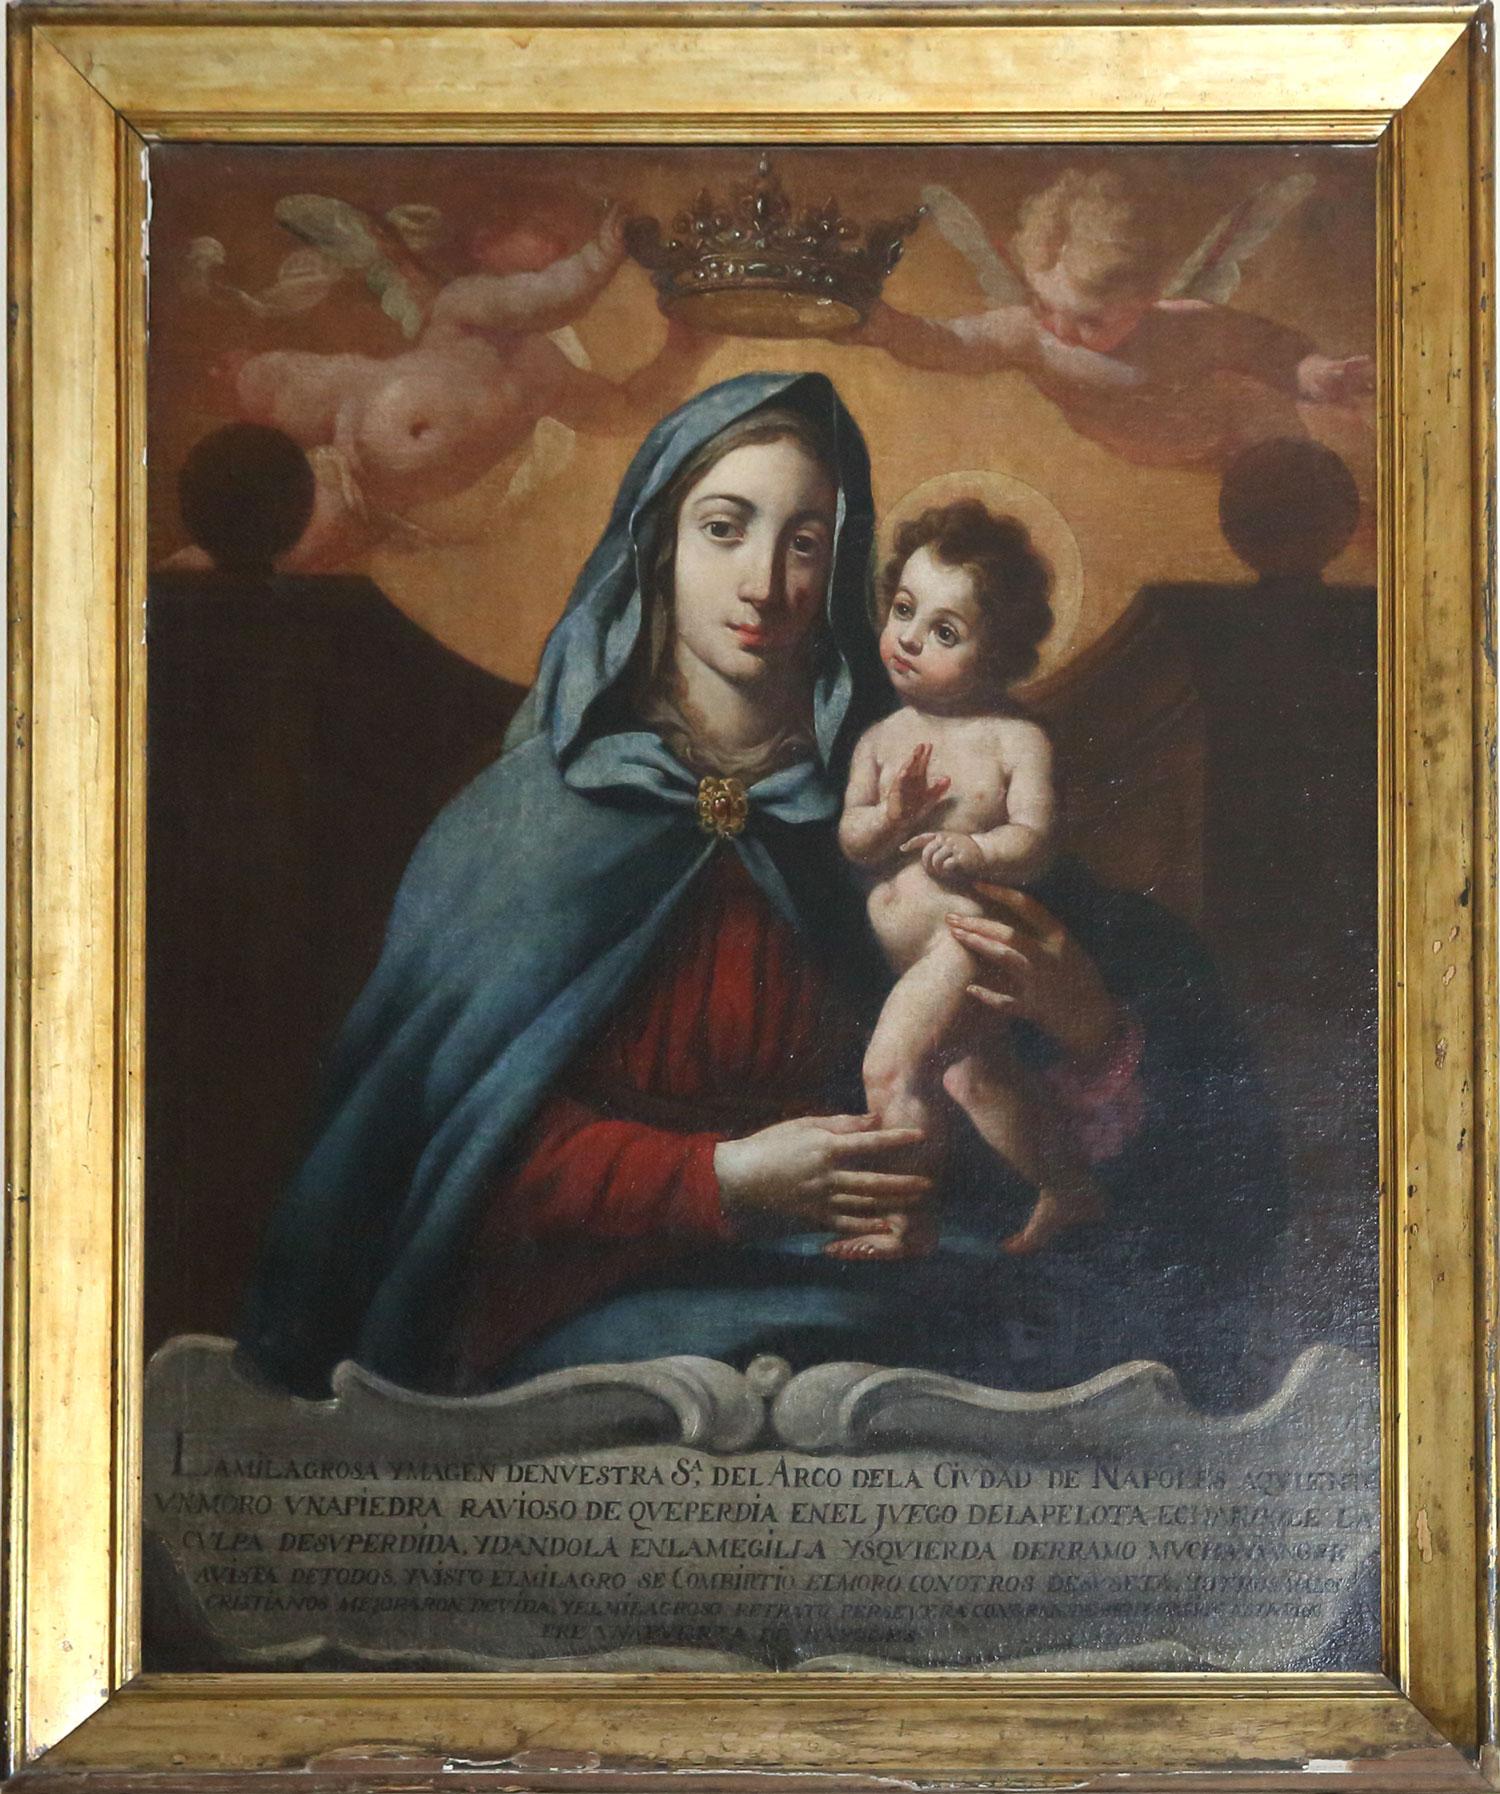 Virgen del Arco